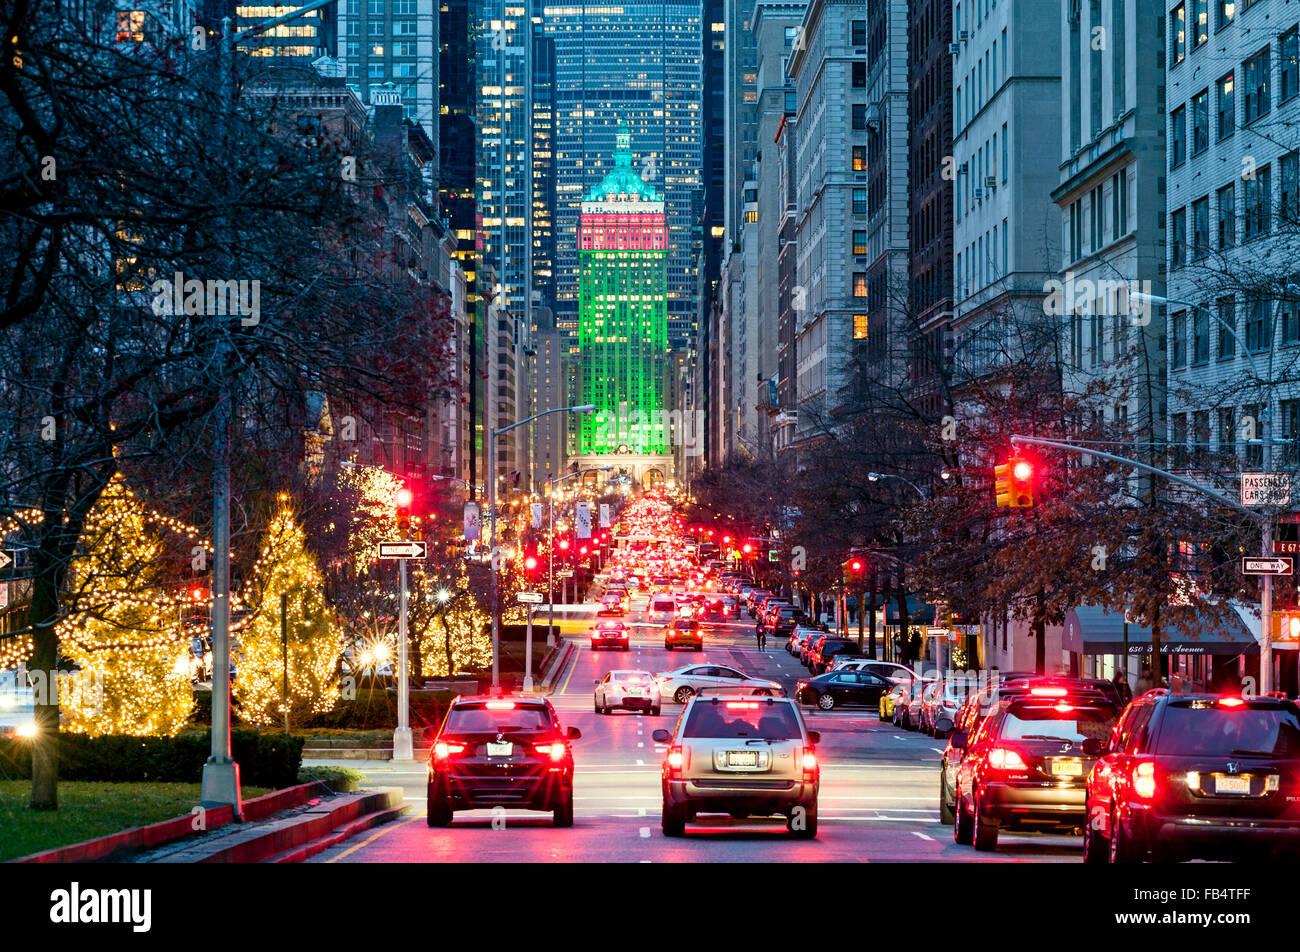 New York New York Rues Park Avenue New York Décorations de Noël le ...